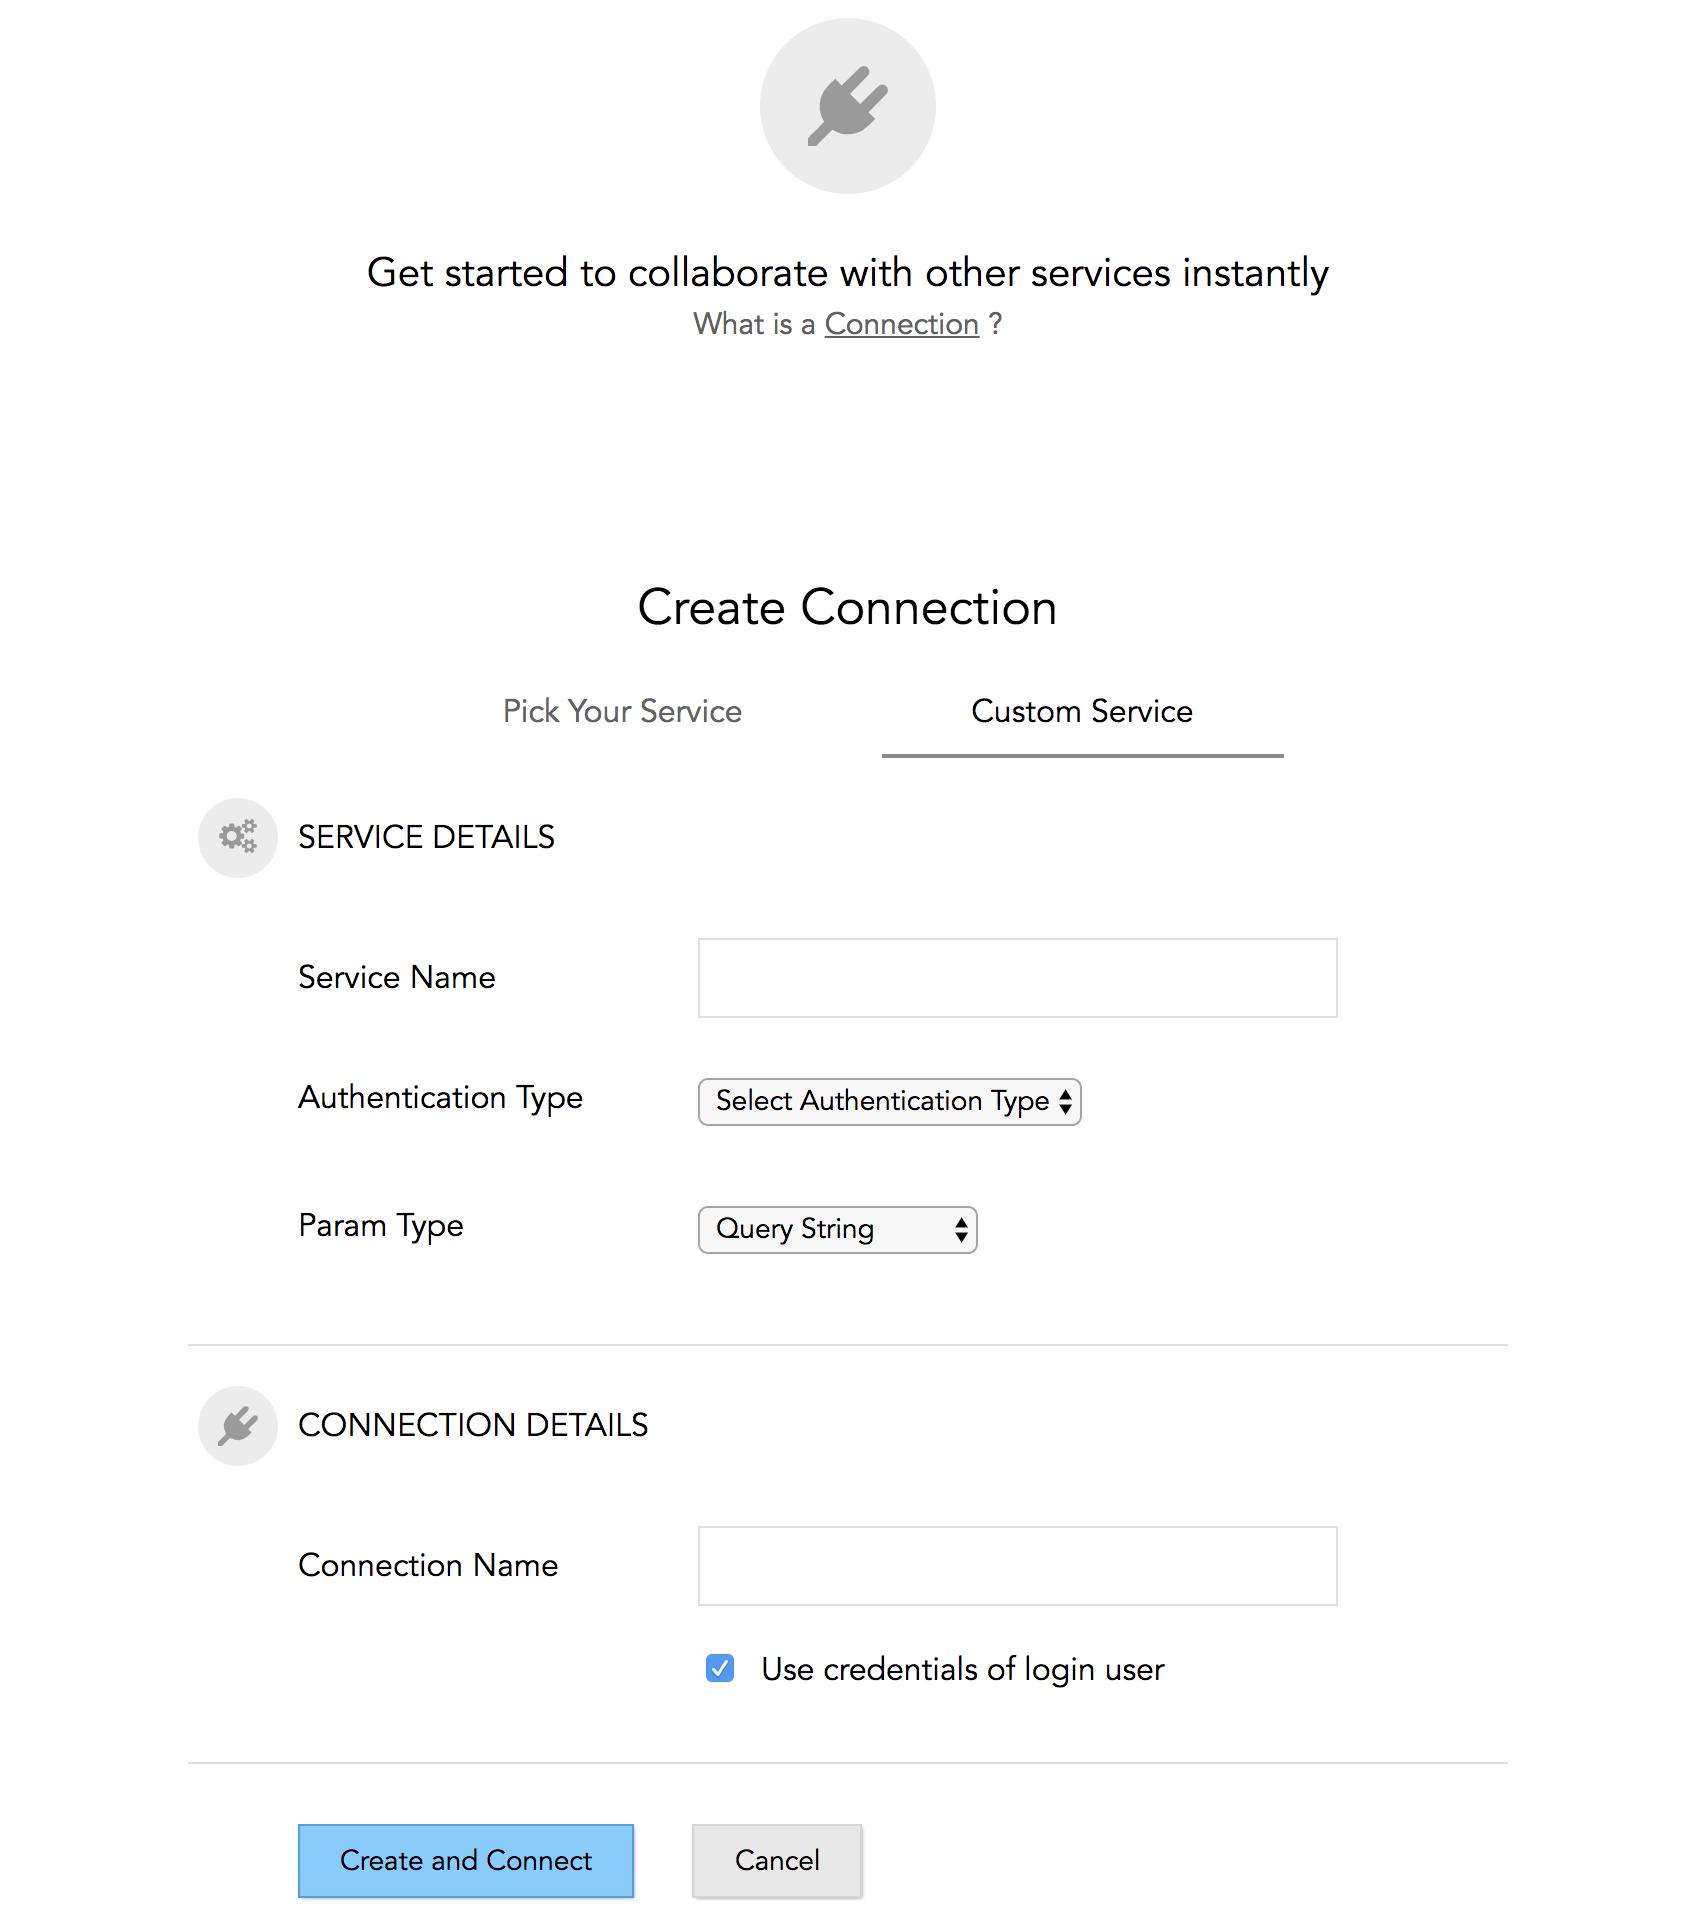 Select a custom service